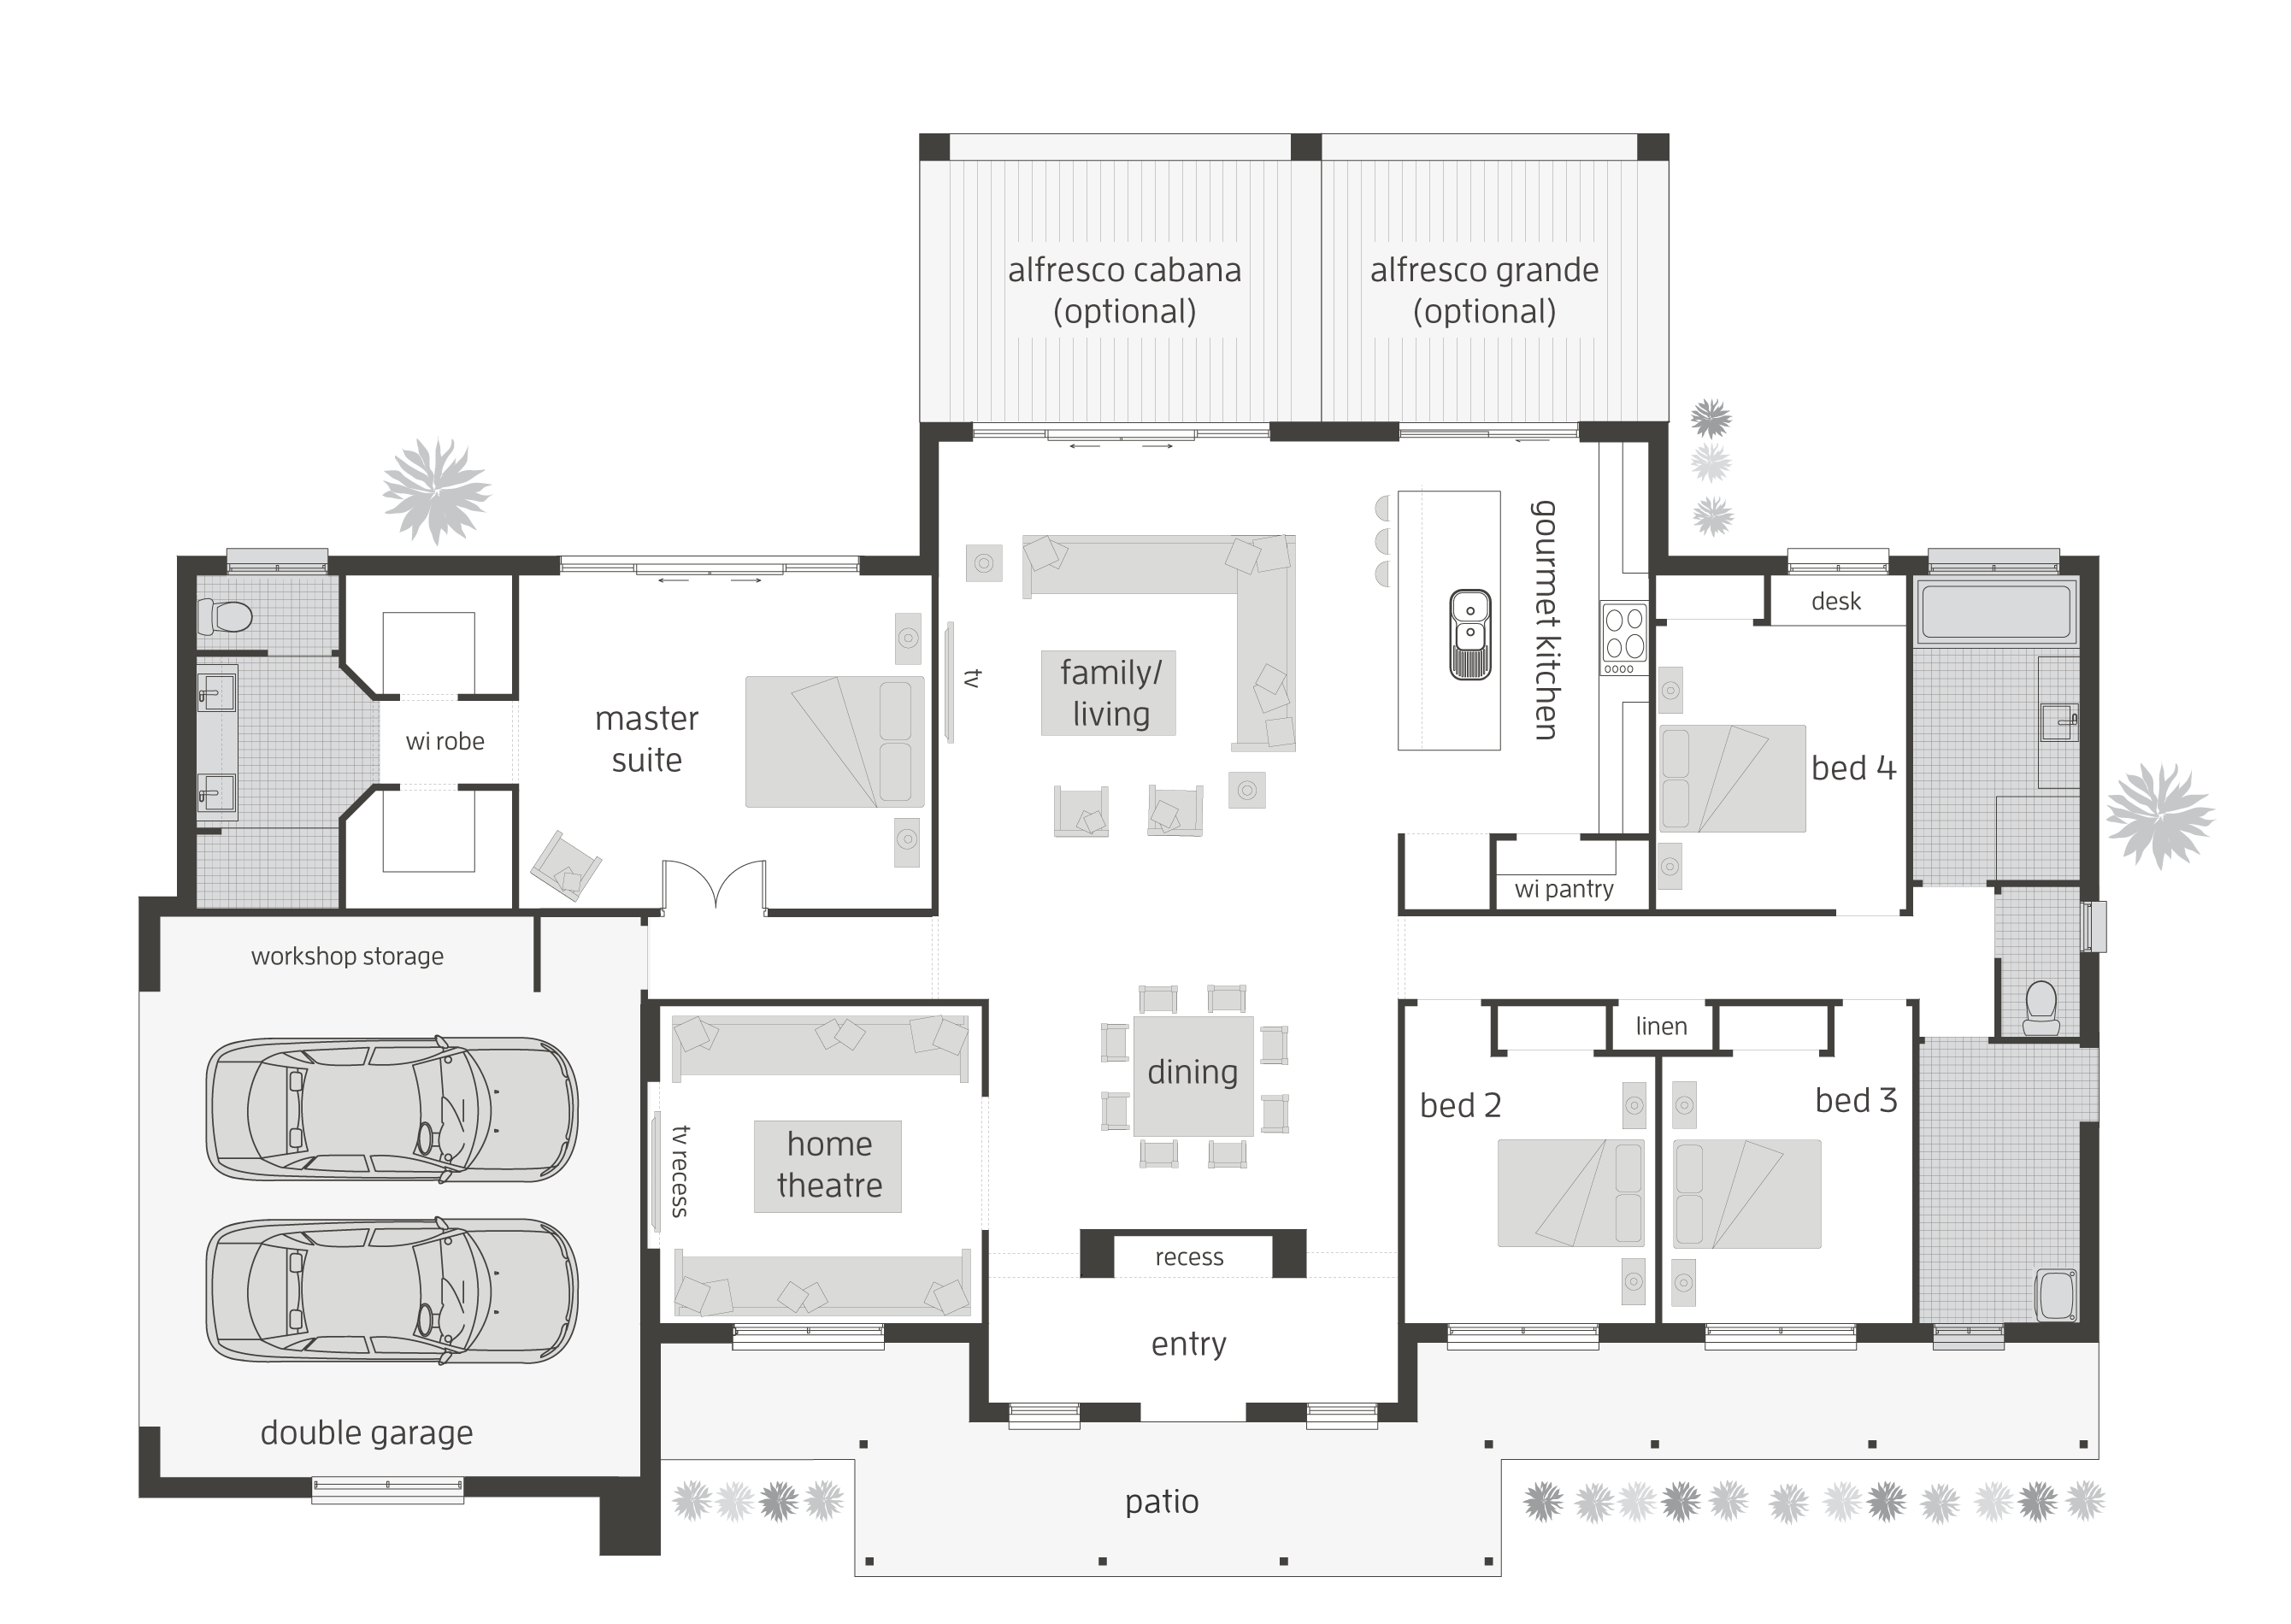 acreage-home-designs-mcdonald-jones-woodlandsmanor-sidegarage-lhs ...